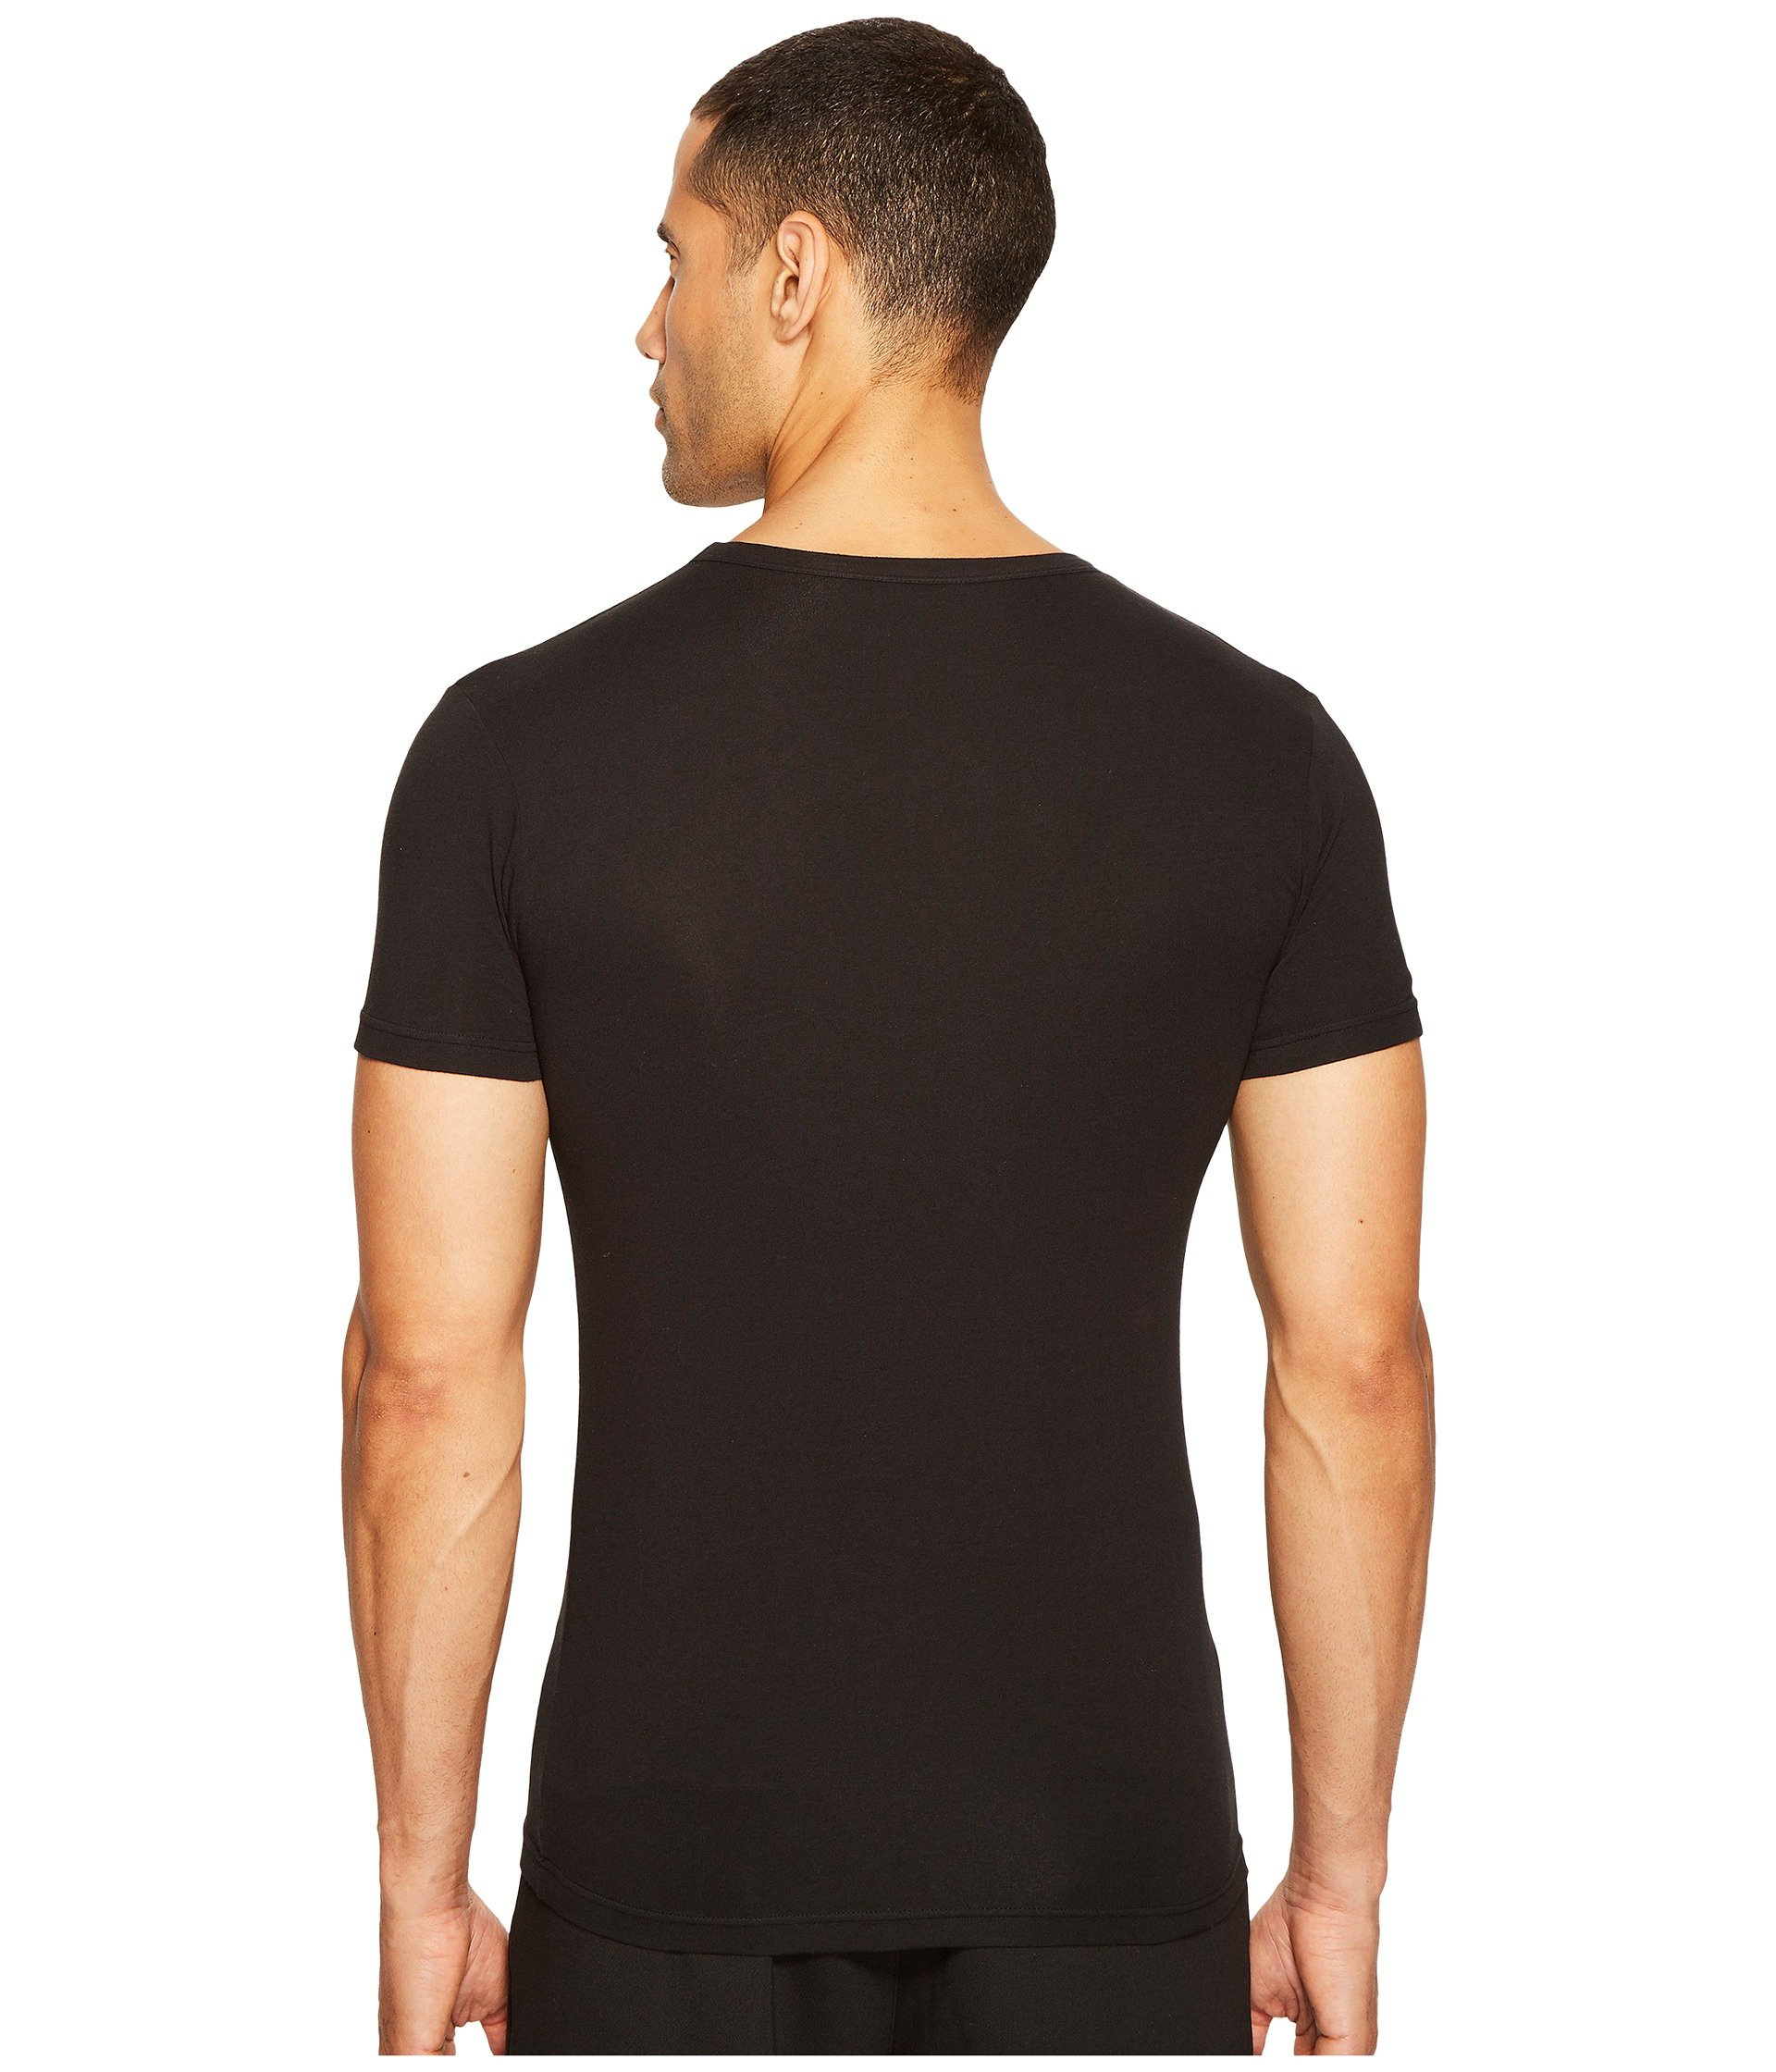 Stretch Tee Emporio Armani Cotton V Black neck XBn8wzS5n